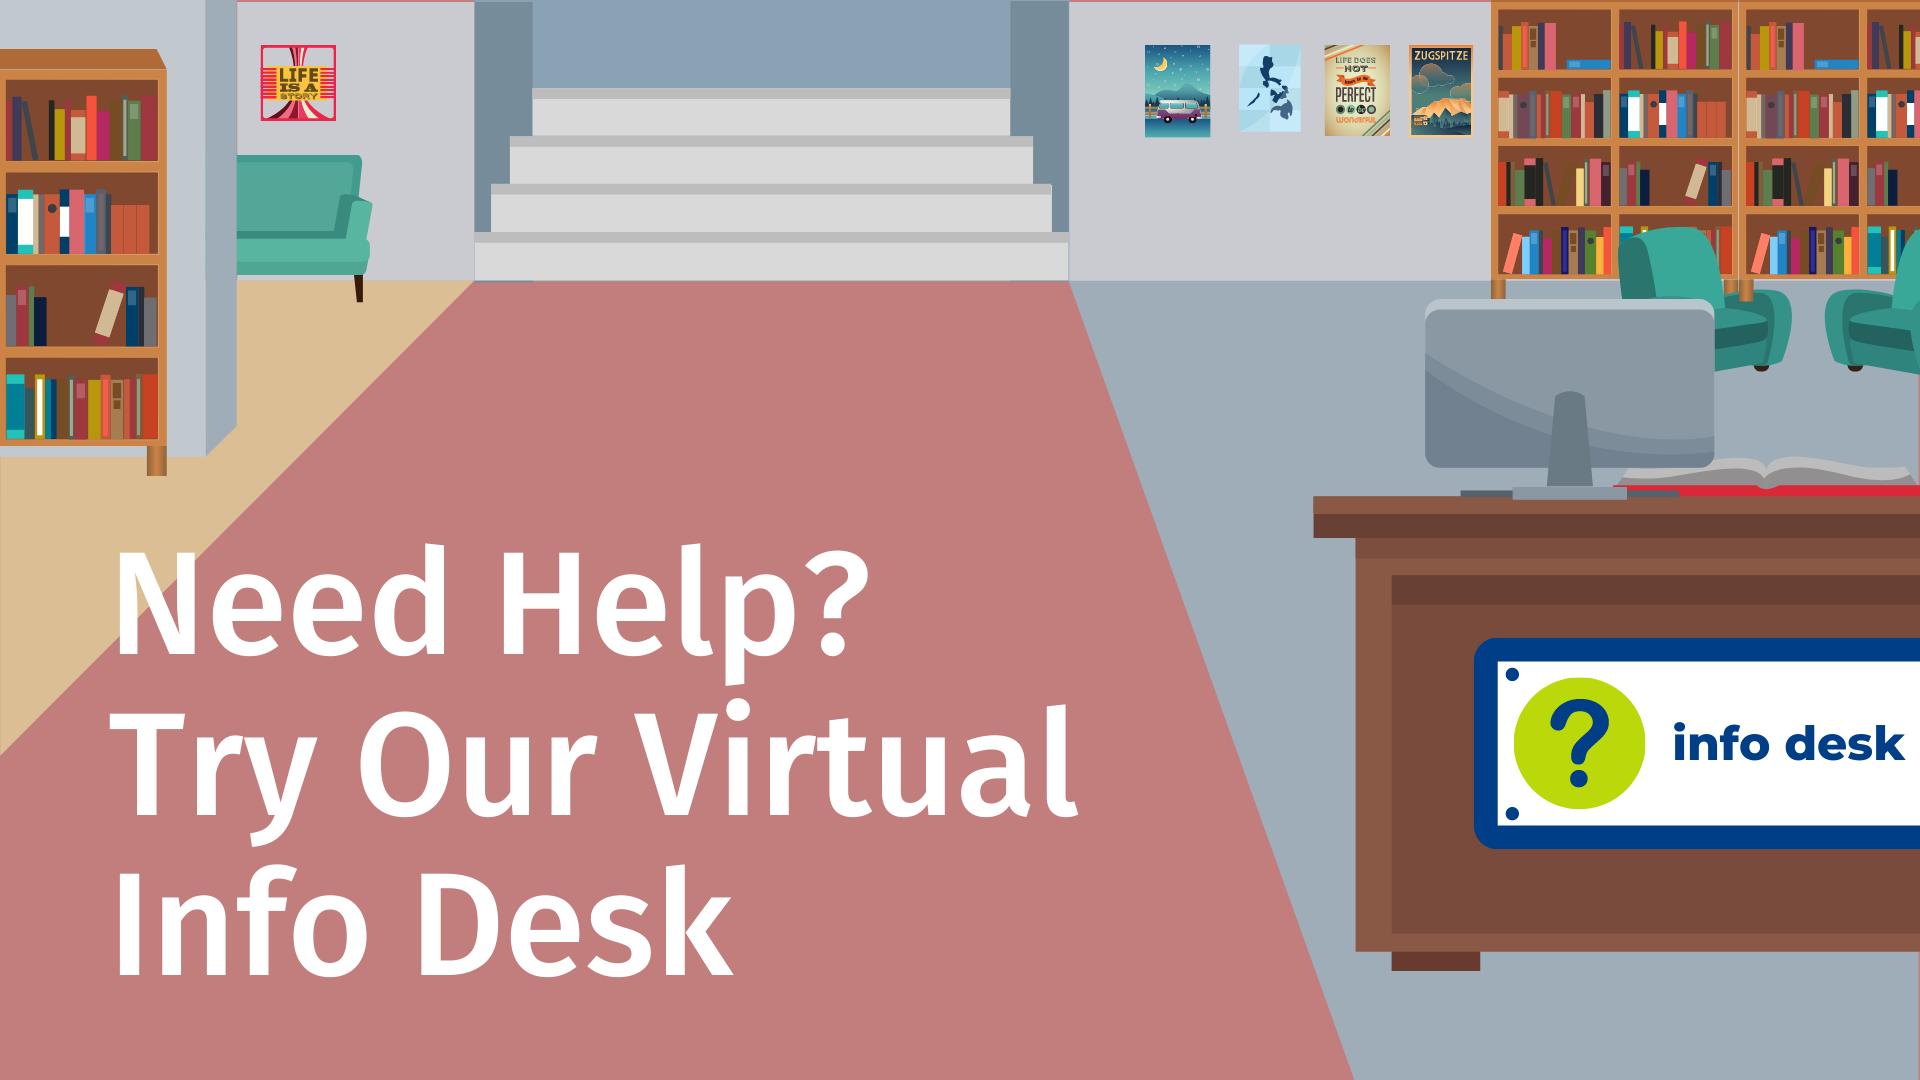 Visit the Virtual Info Desk!